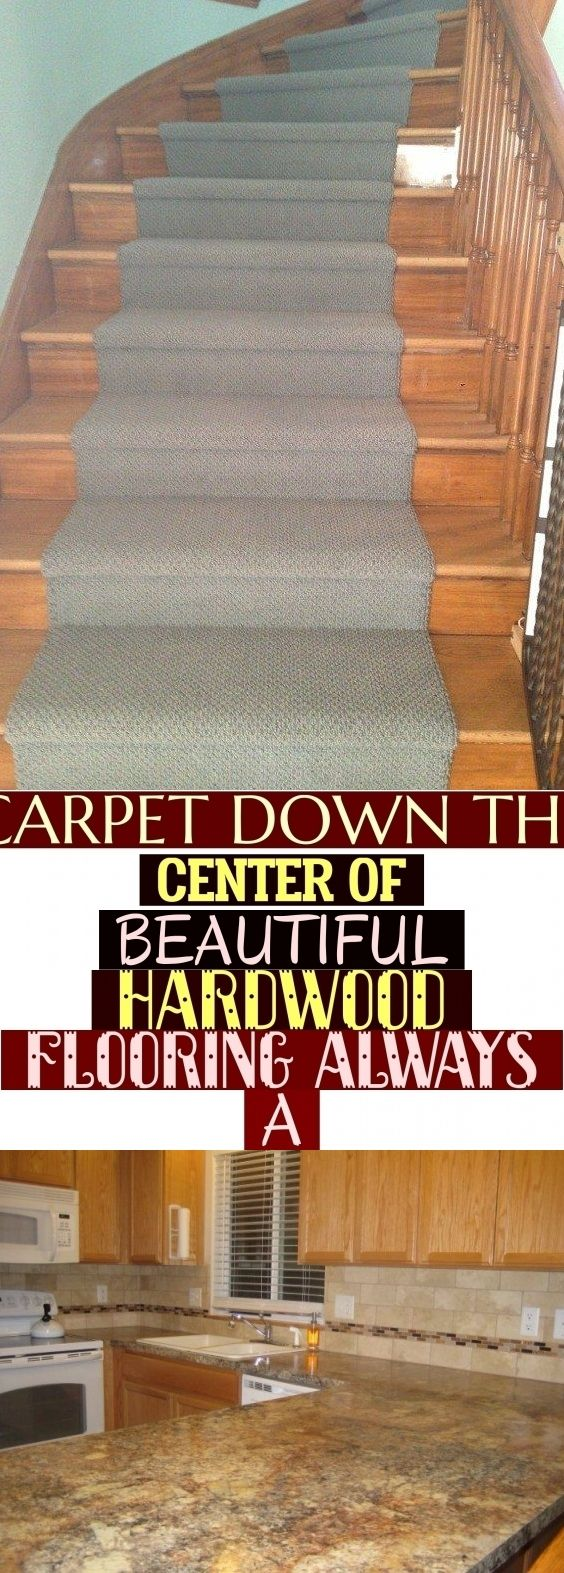 Carpet Down The Center Of Beautiful Hardwood Flooring